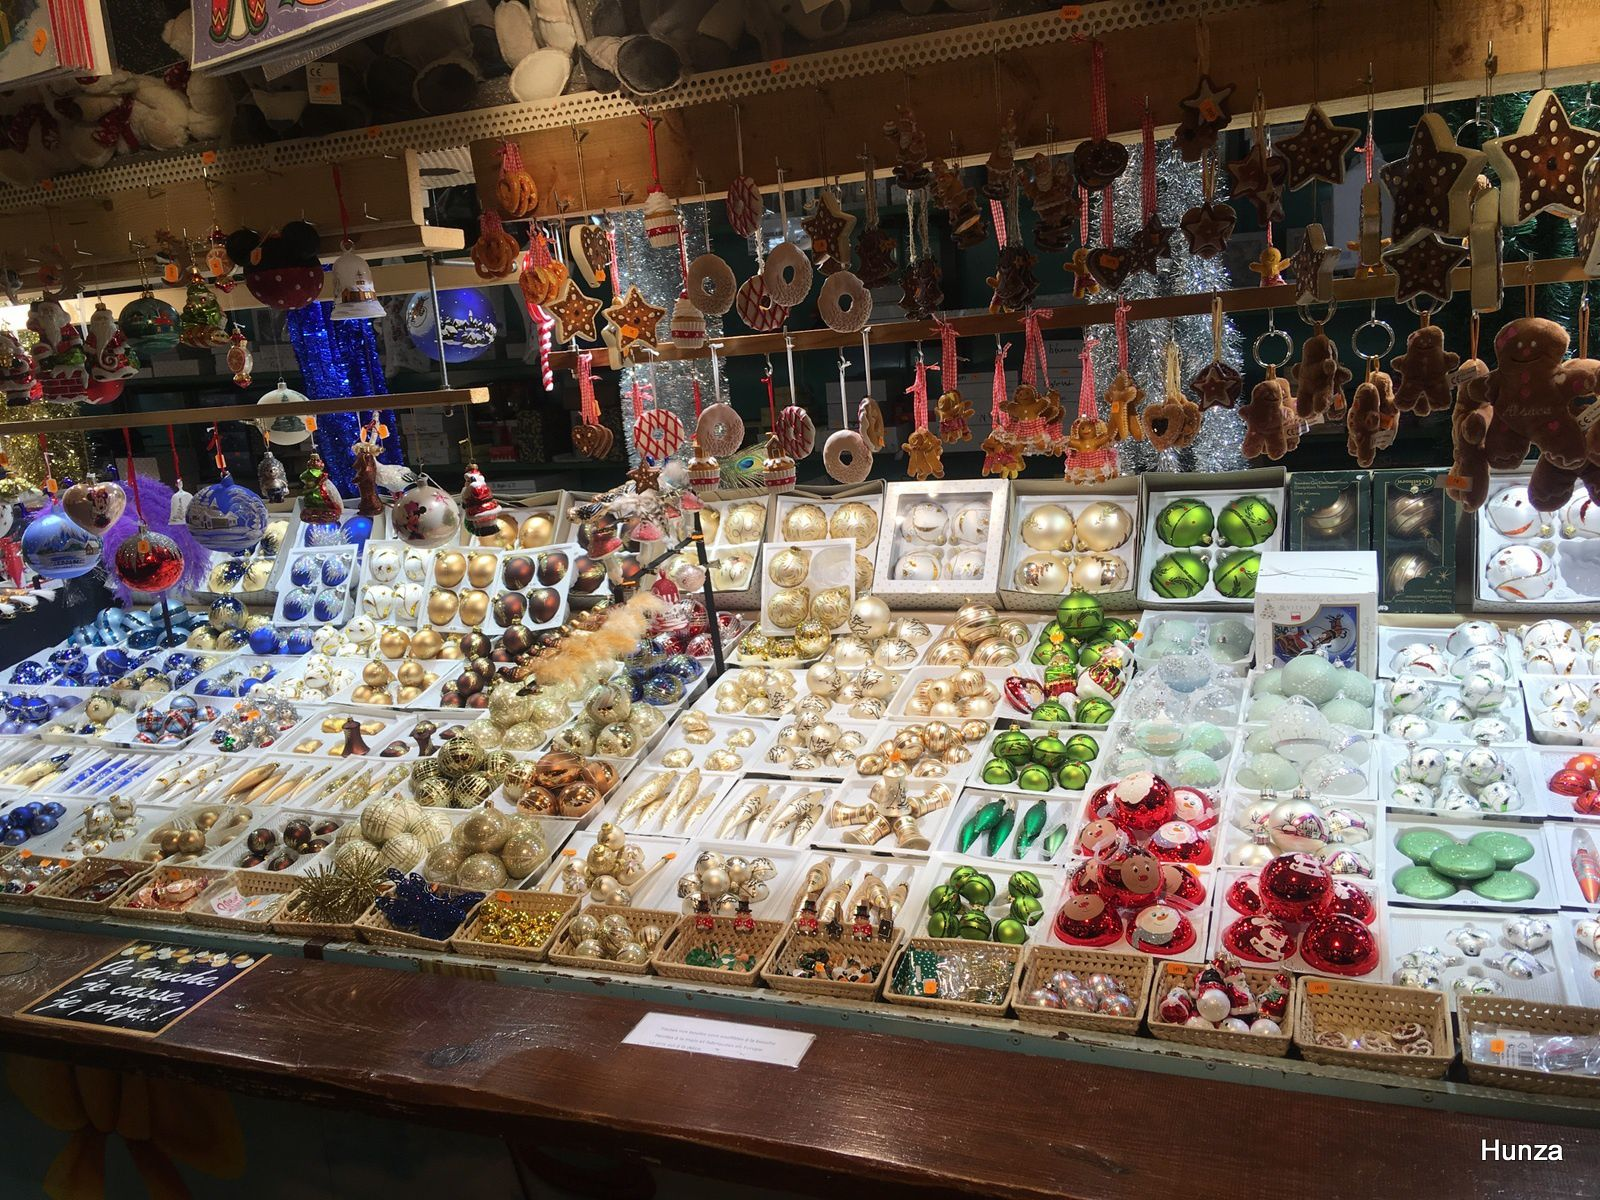 Balade photo au marché de Noël de Strasbourg